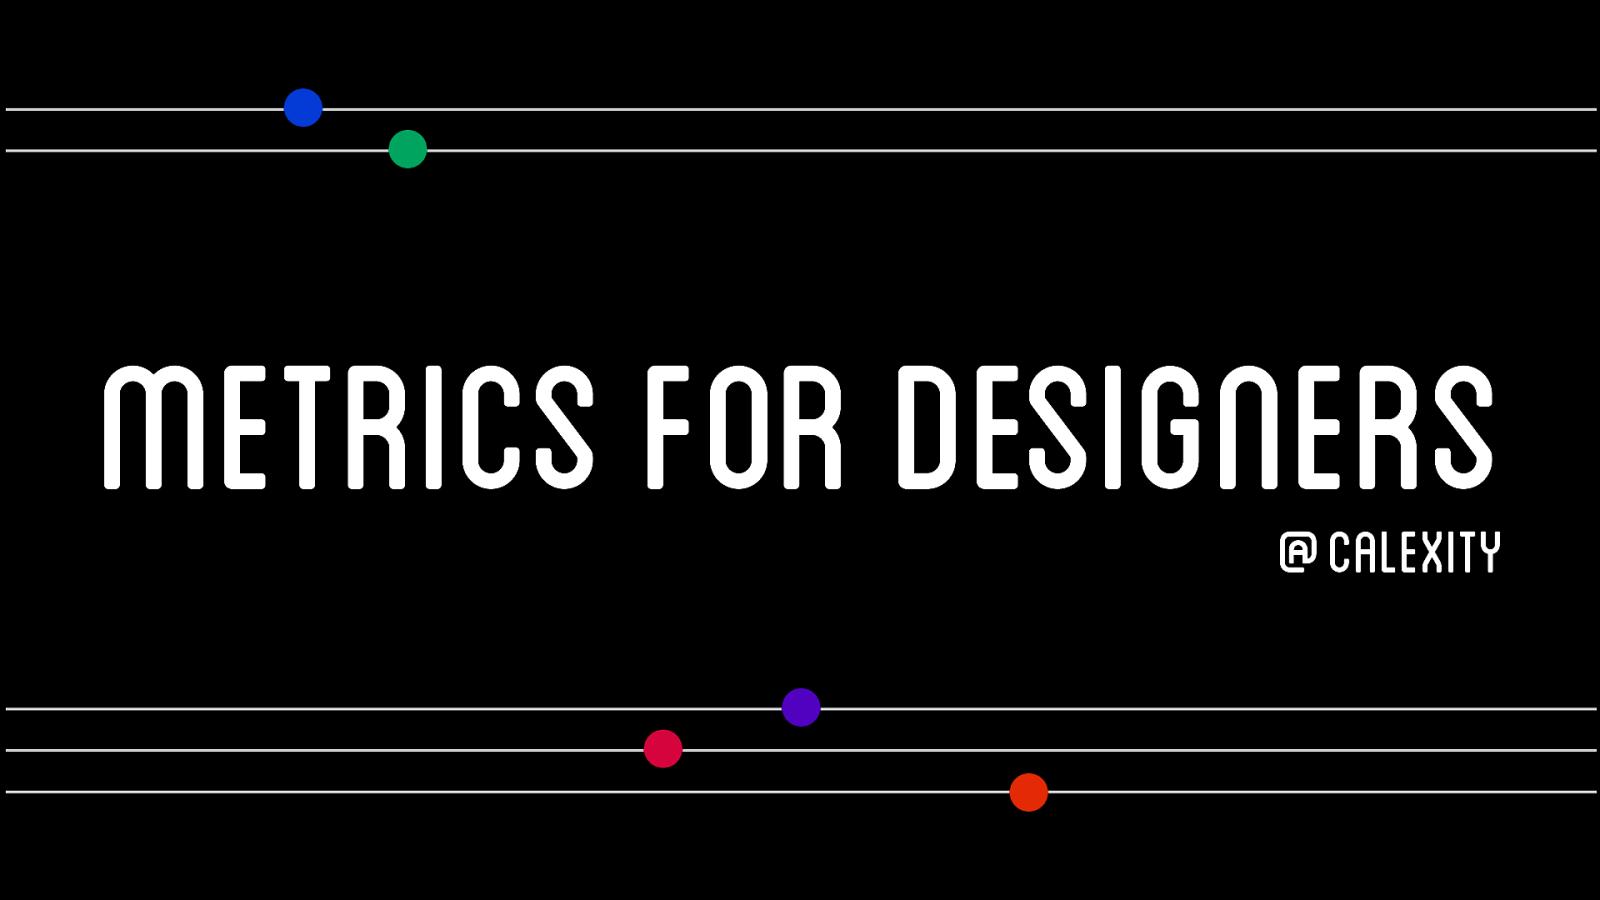 Metrics for Designers